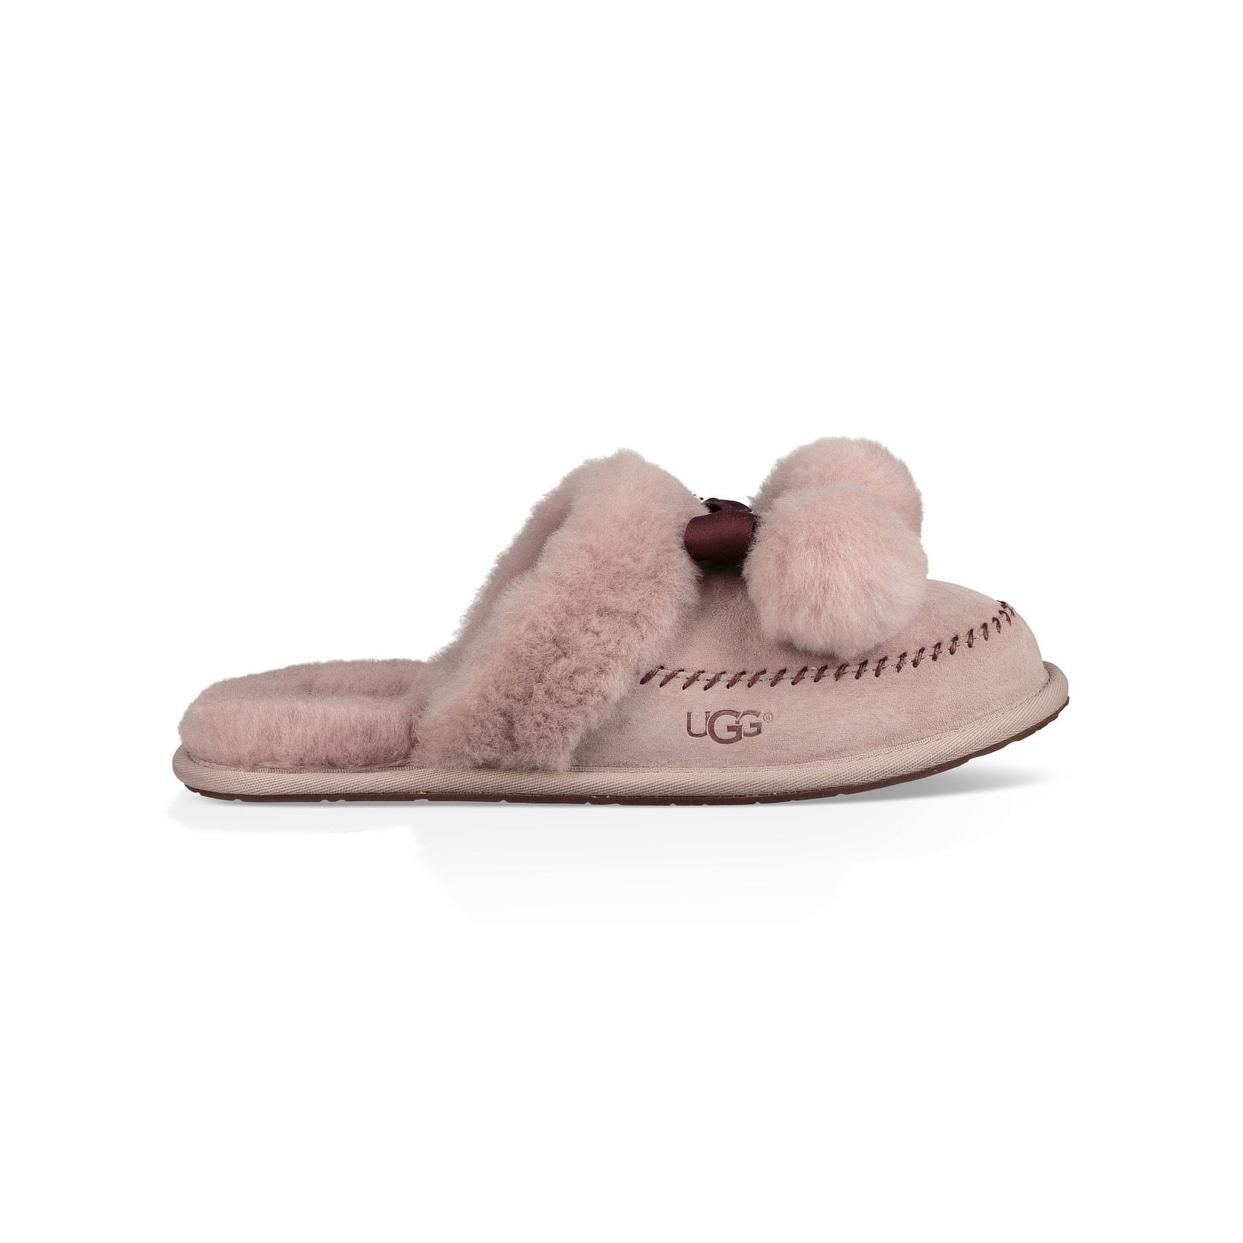 91213a1b52 Shop Ugg Womens Hafnir Leather Closed Toe Slip On Slippers - Free ...